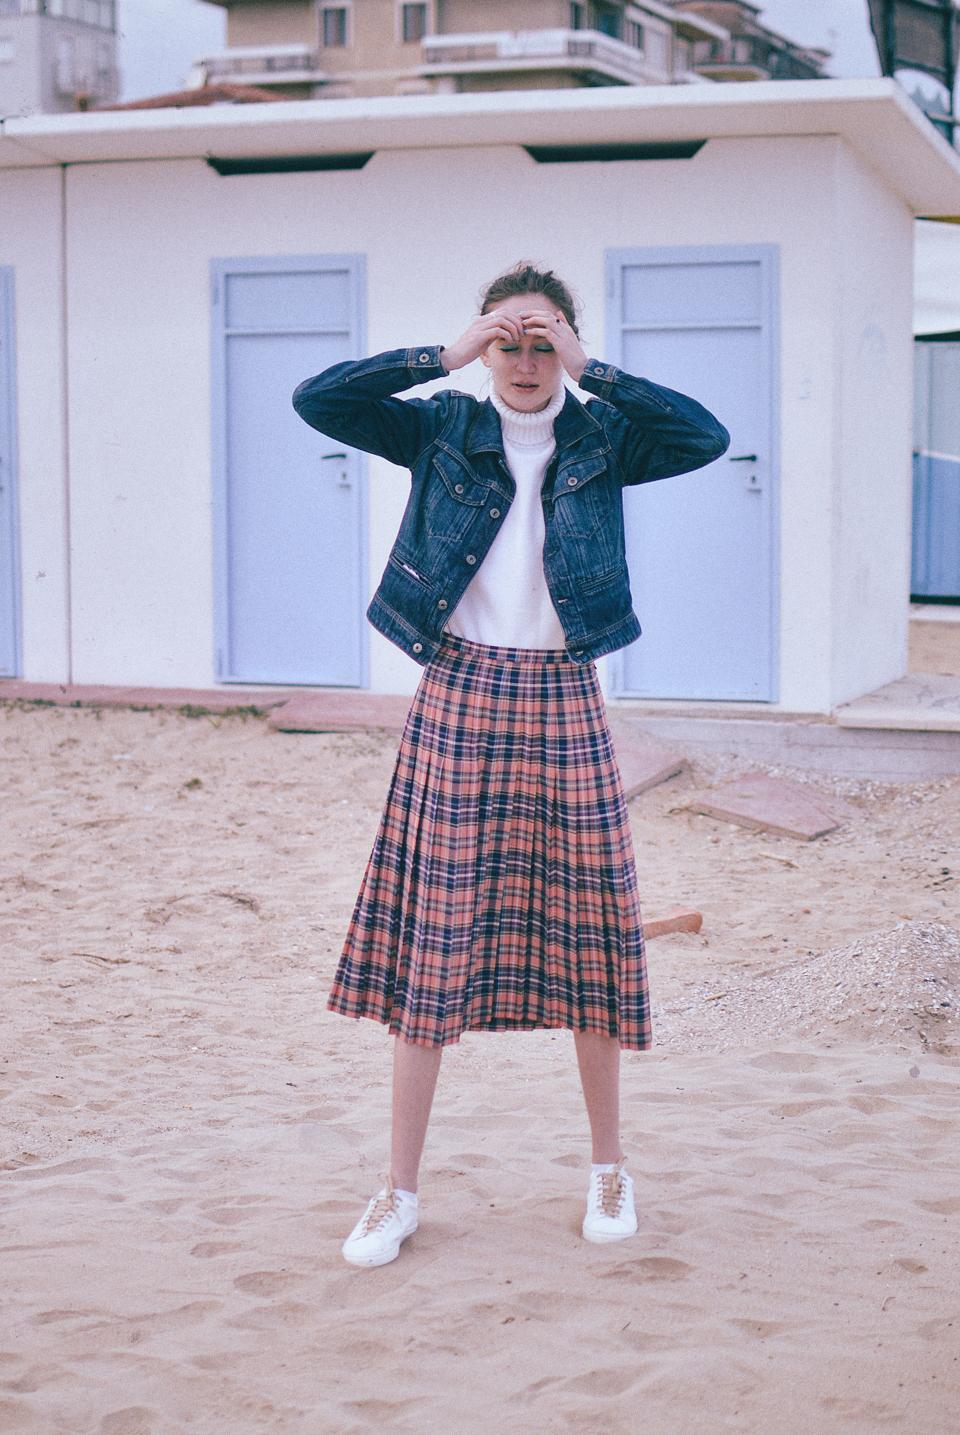 dae7d0f17003 Fast-fashion Greenwashing Q A - Charity shop outfit ideas